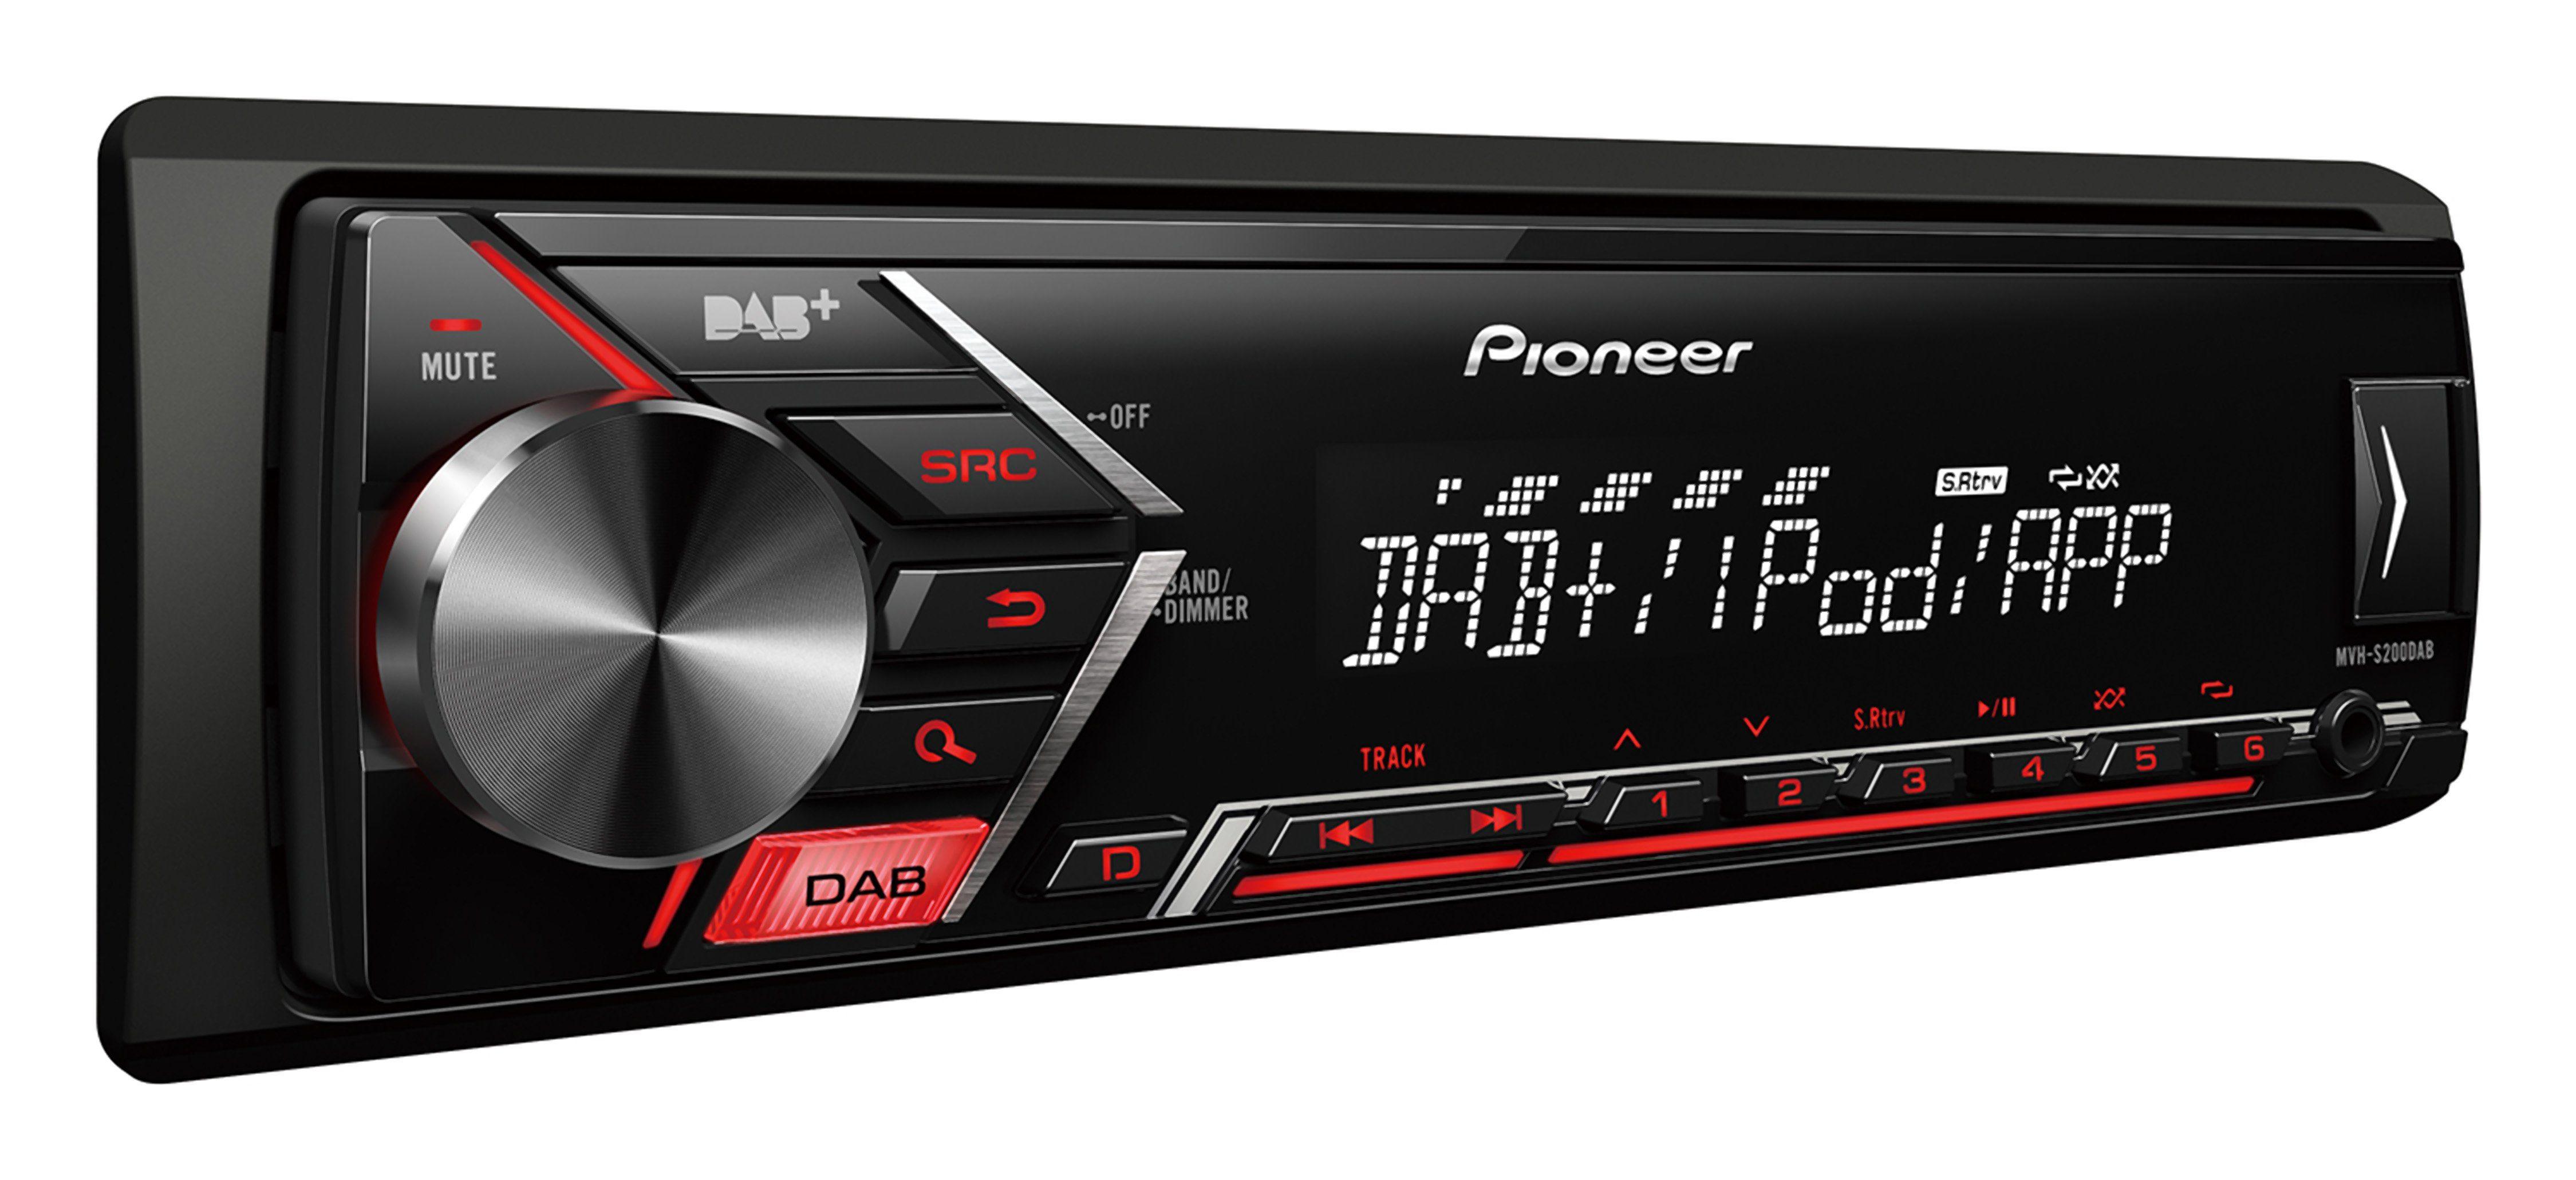 PIONEER 1-DIN Autoradio mit UKW, DAB+ Radio / USB & AUX-Eingang »MVH-S200DAB«